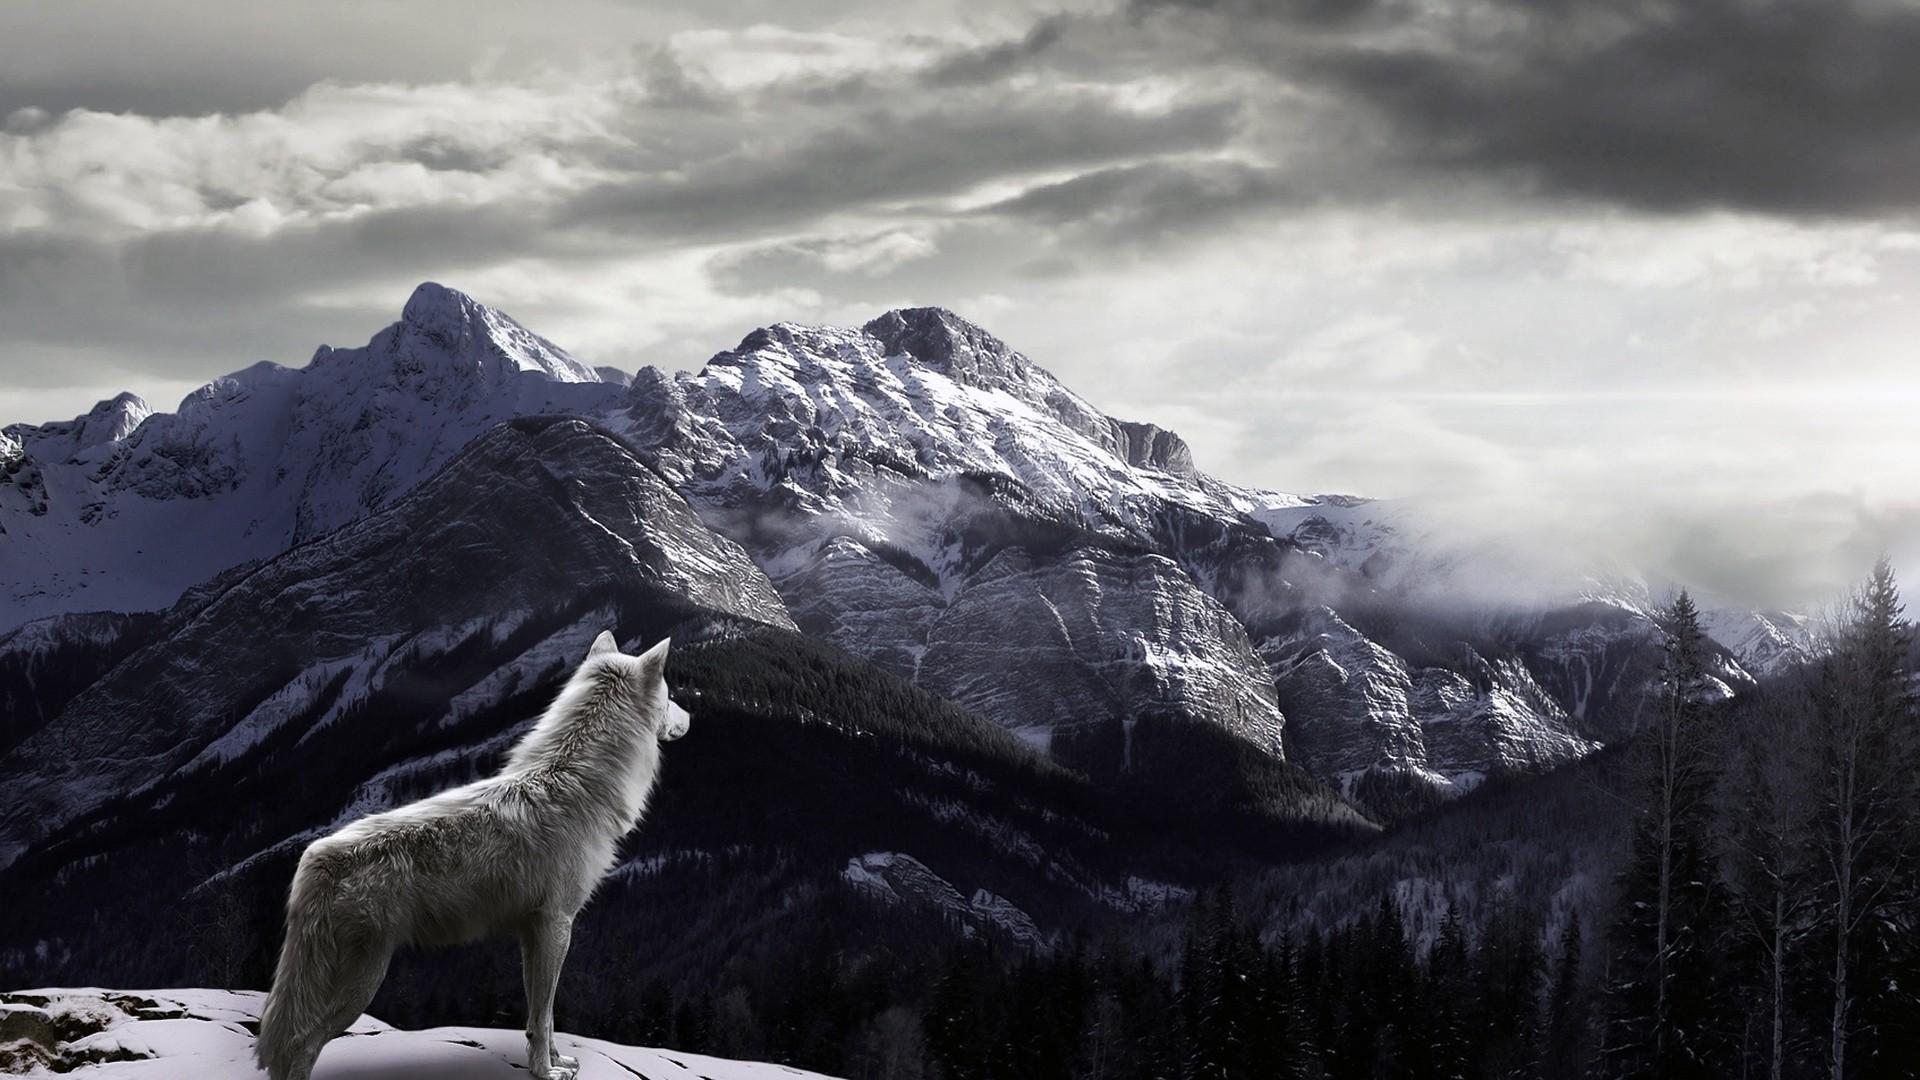 4k wolf wallpaper 43 images - 1920x1080 wallpaper 4k ...